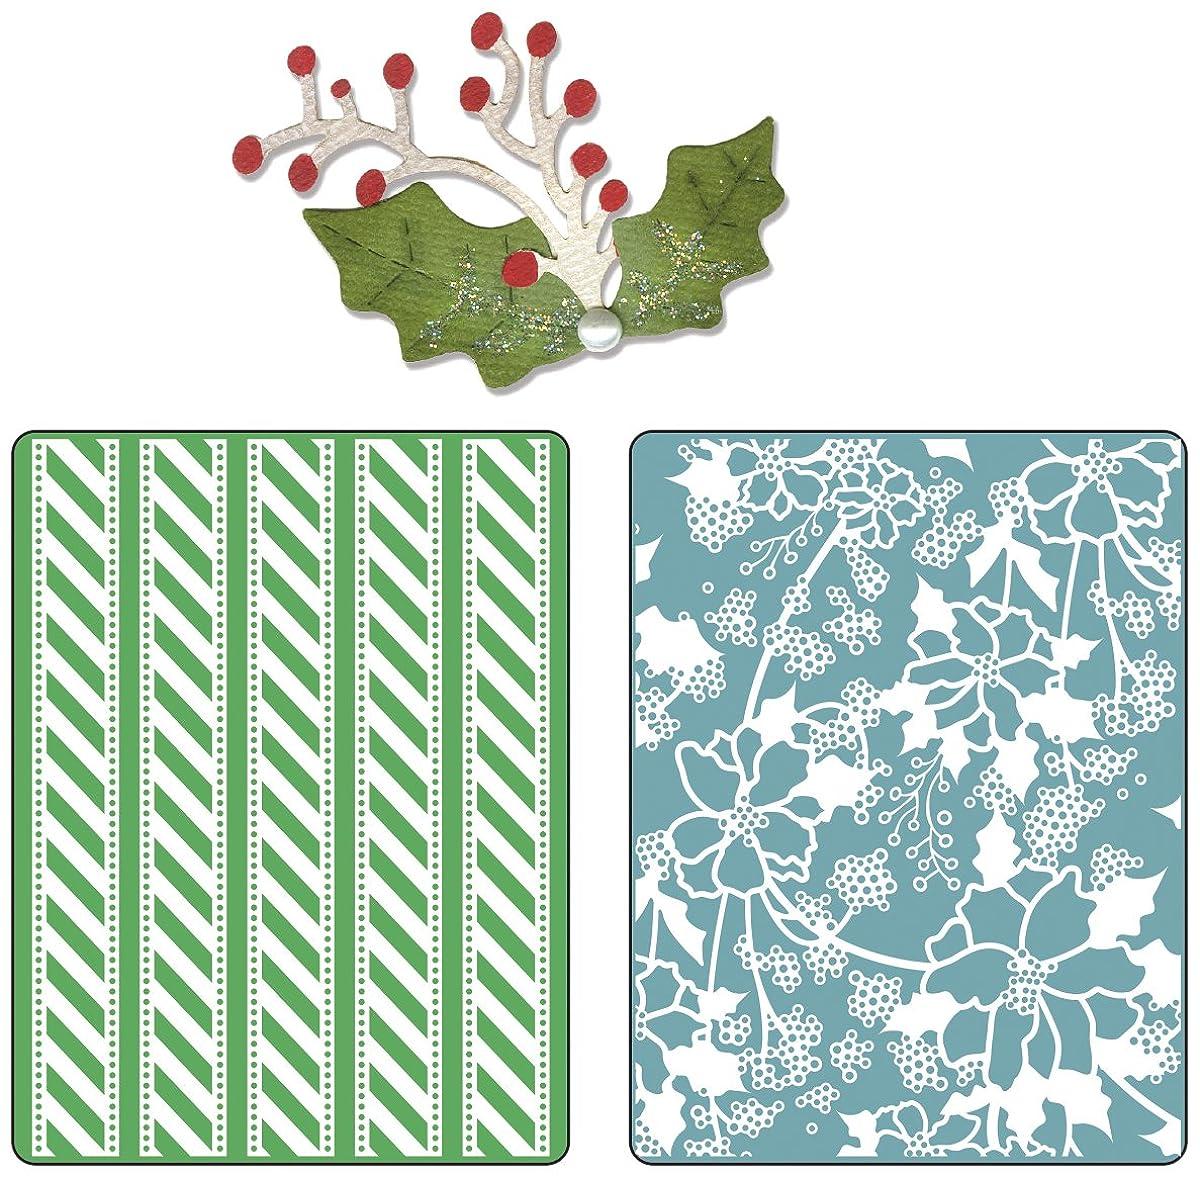 Sizzix Textured Impressions Embossing Folders with Bonus Sizzlits Die - Alpine Pattern & Flowers Set by BasicGrey